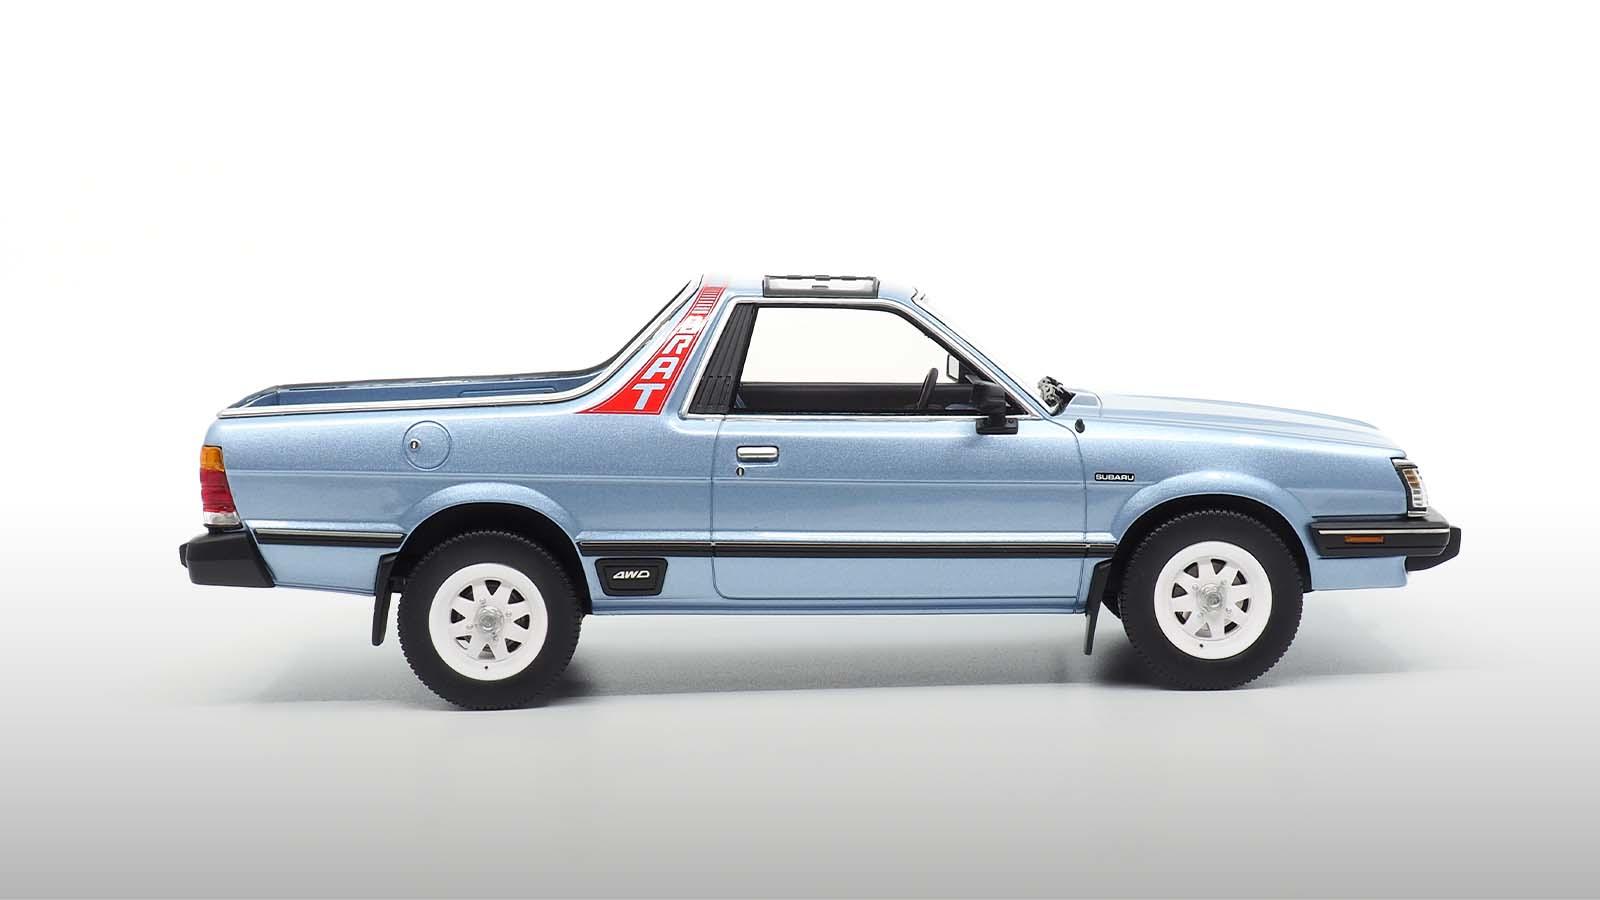 1/18 Subaru Brat DNA